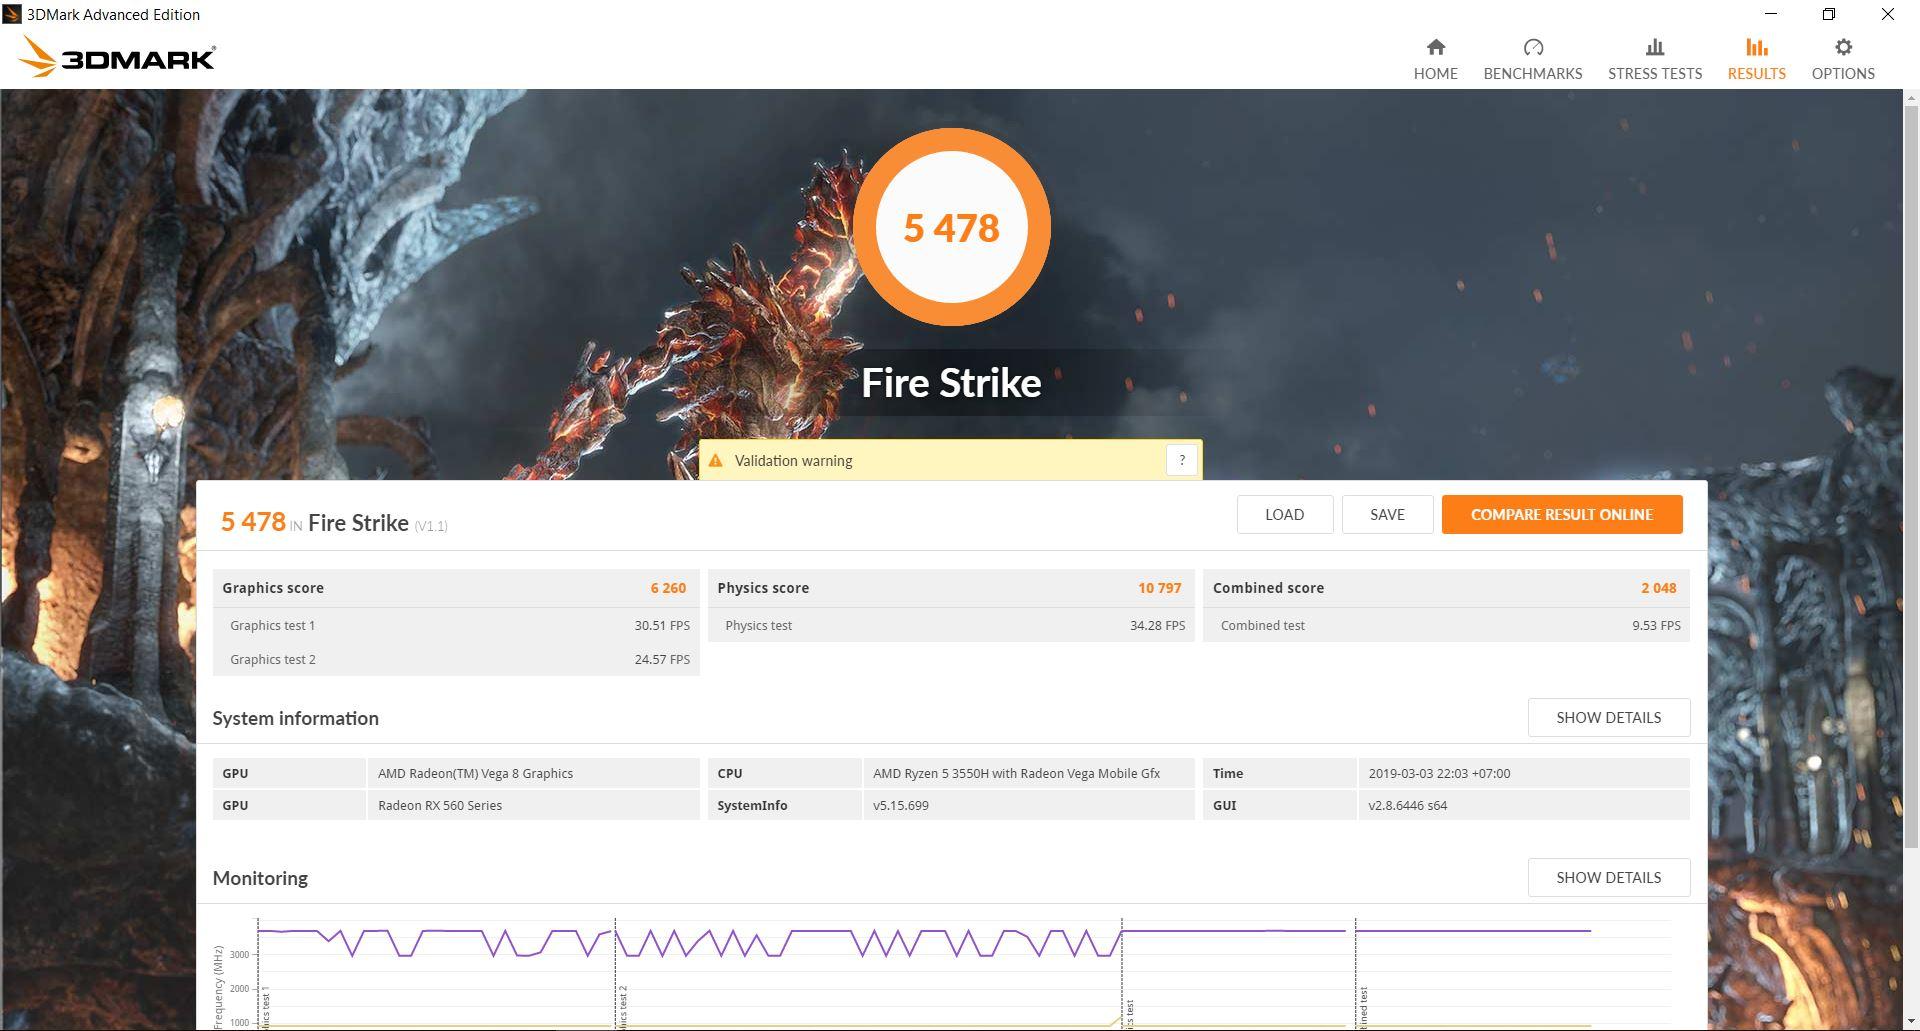 ASUS TUF FX505 DY Fire Strike